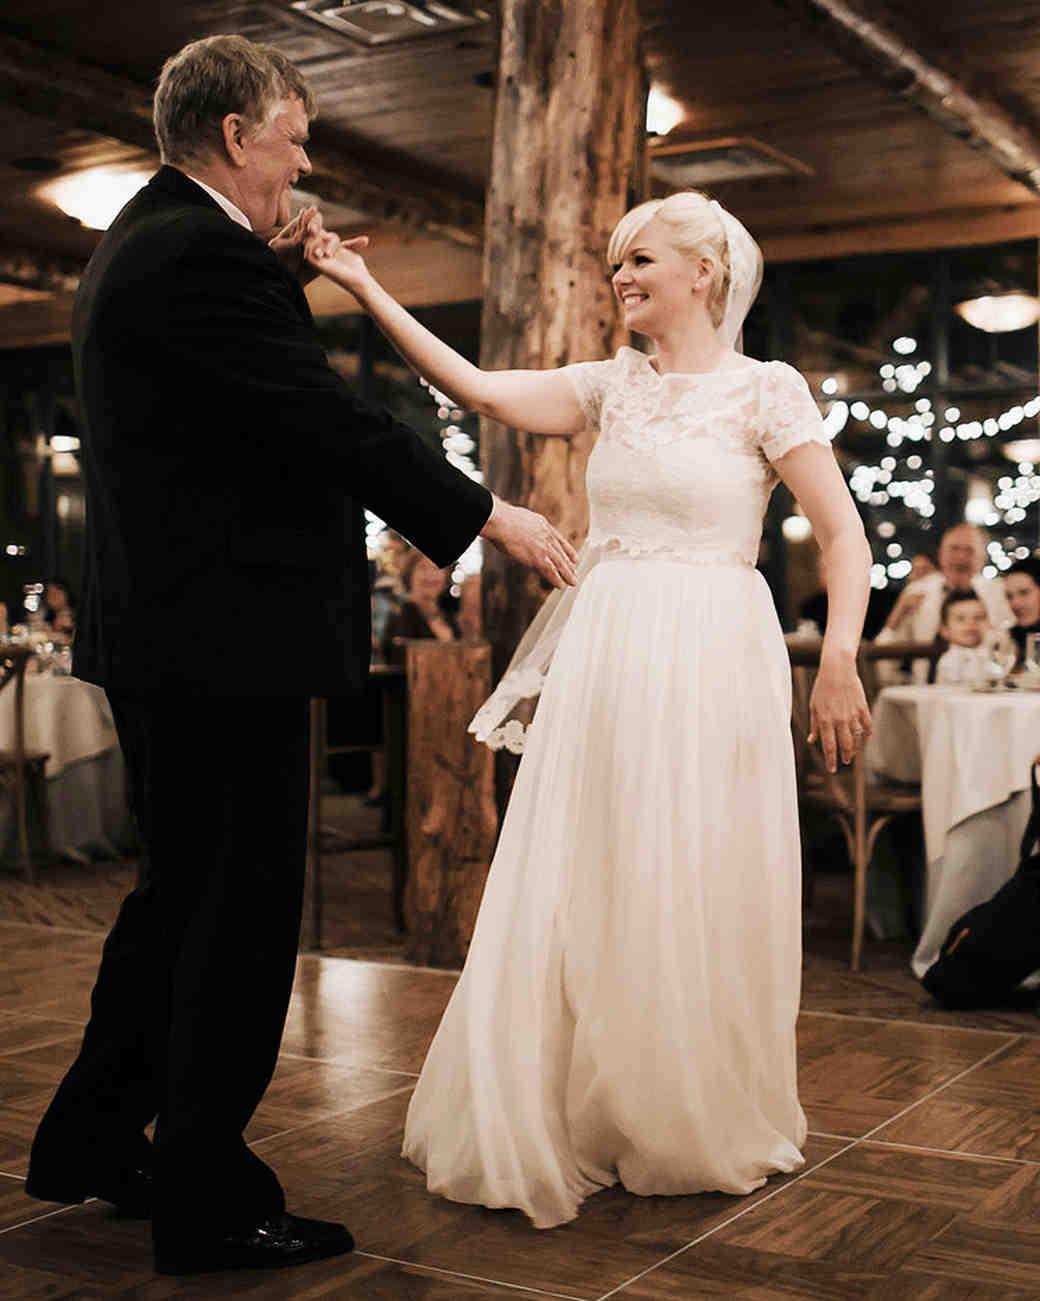 ryan-alan-wedding-dad-dance-1049-s112966-0516.jpg